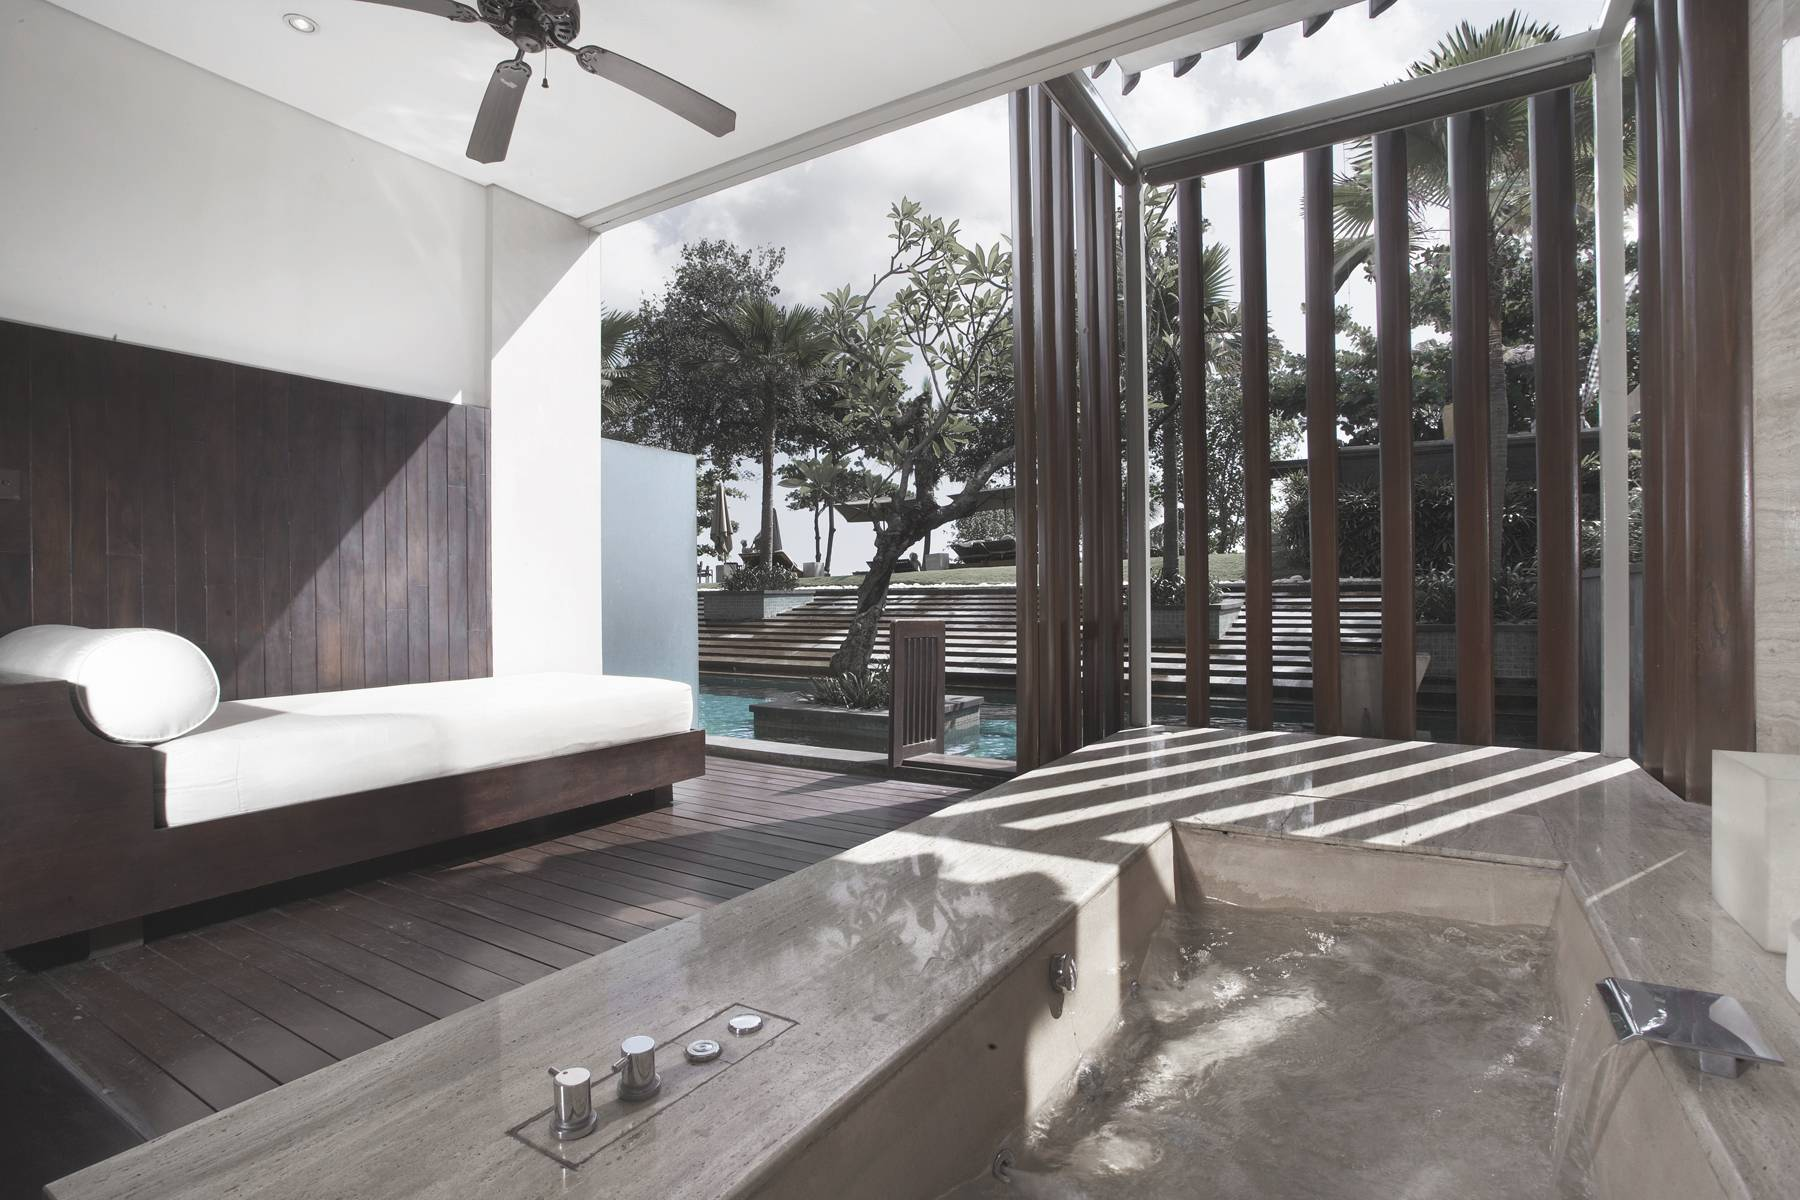 Antony Liu + Ferry Ridwan / Studio Tonton Anantara Seminyak Bali Resort Seminyak, Bali, Indonesia Seminyak, Bali, Indonesia Bathroom Resort Modern  8030